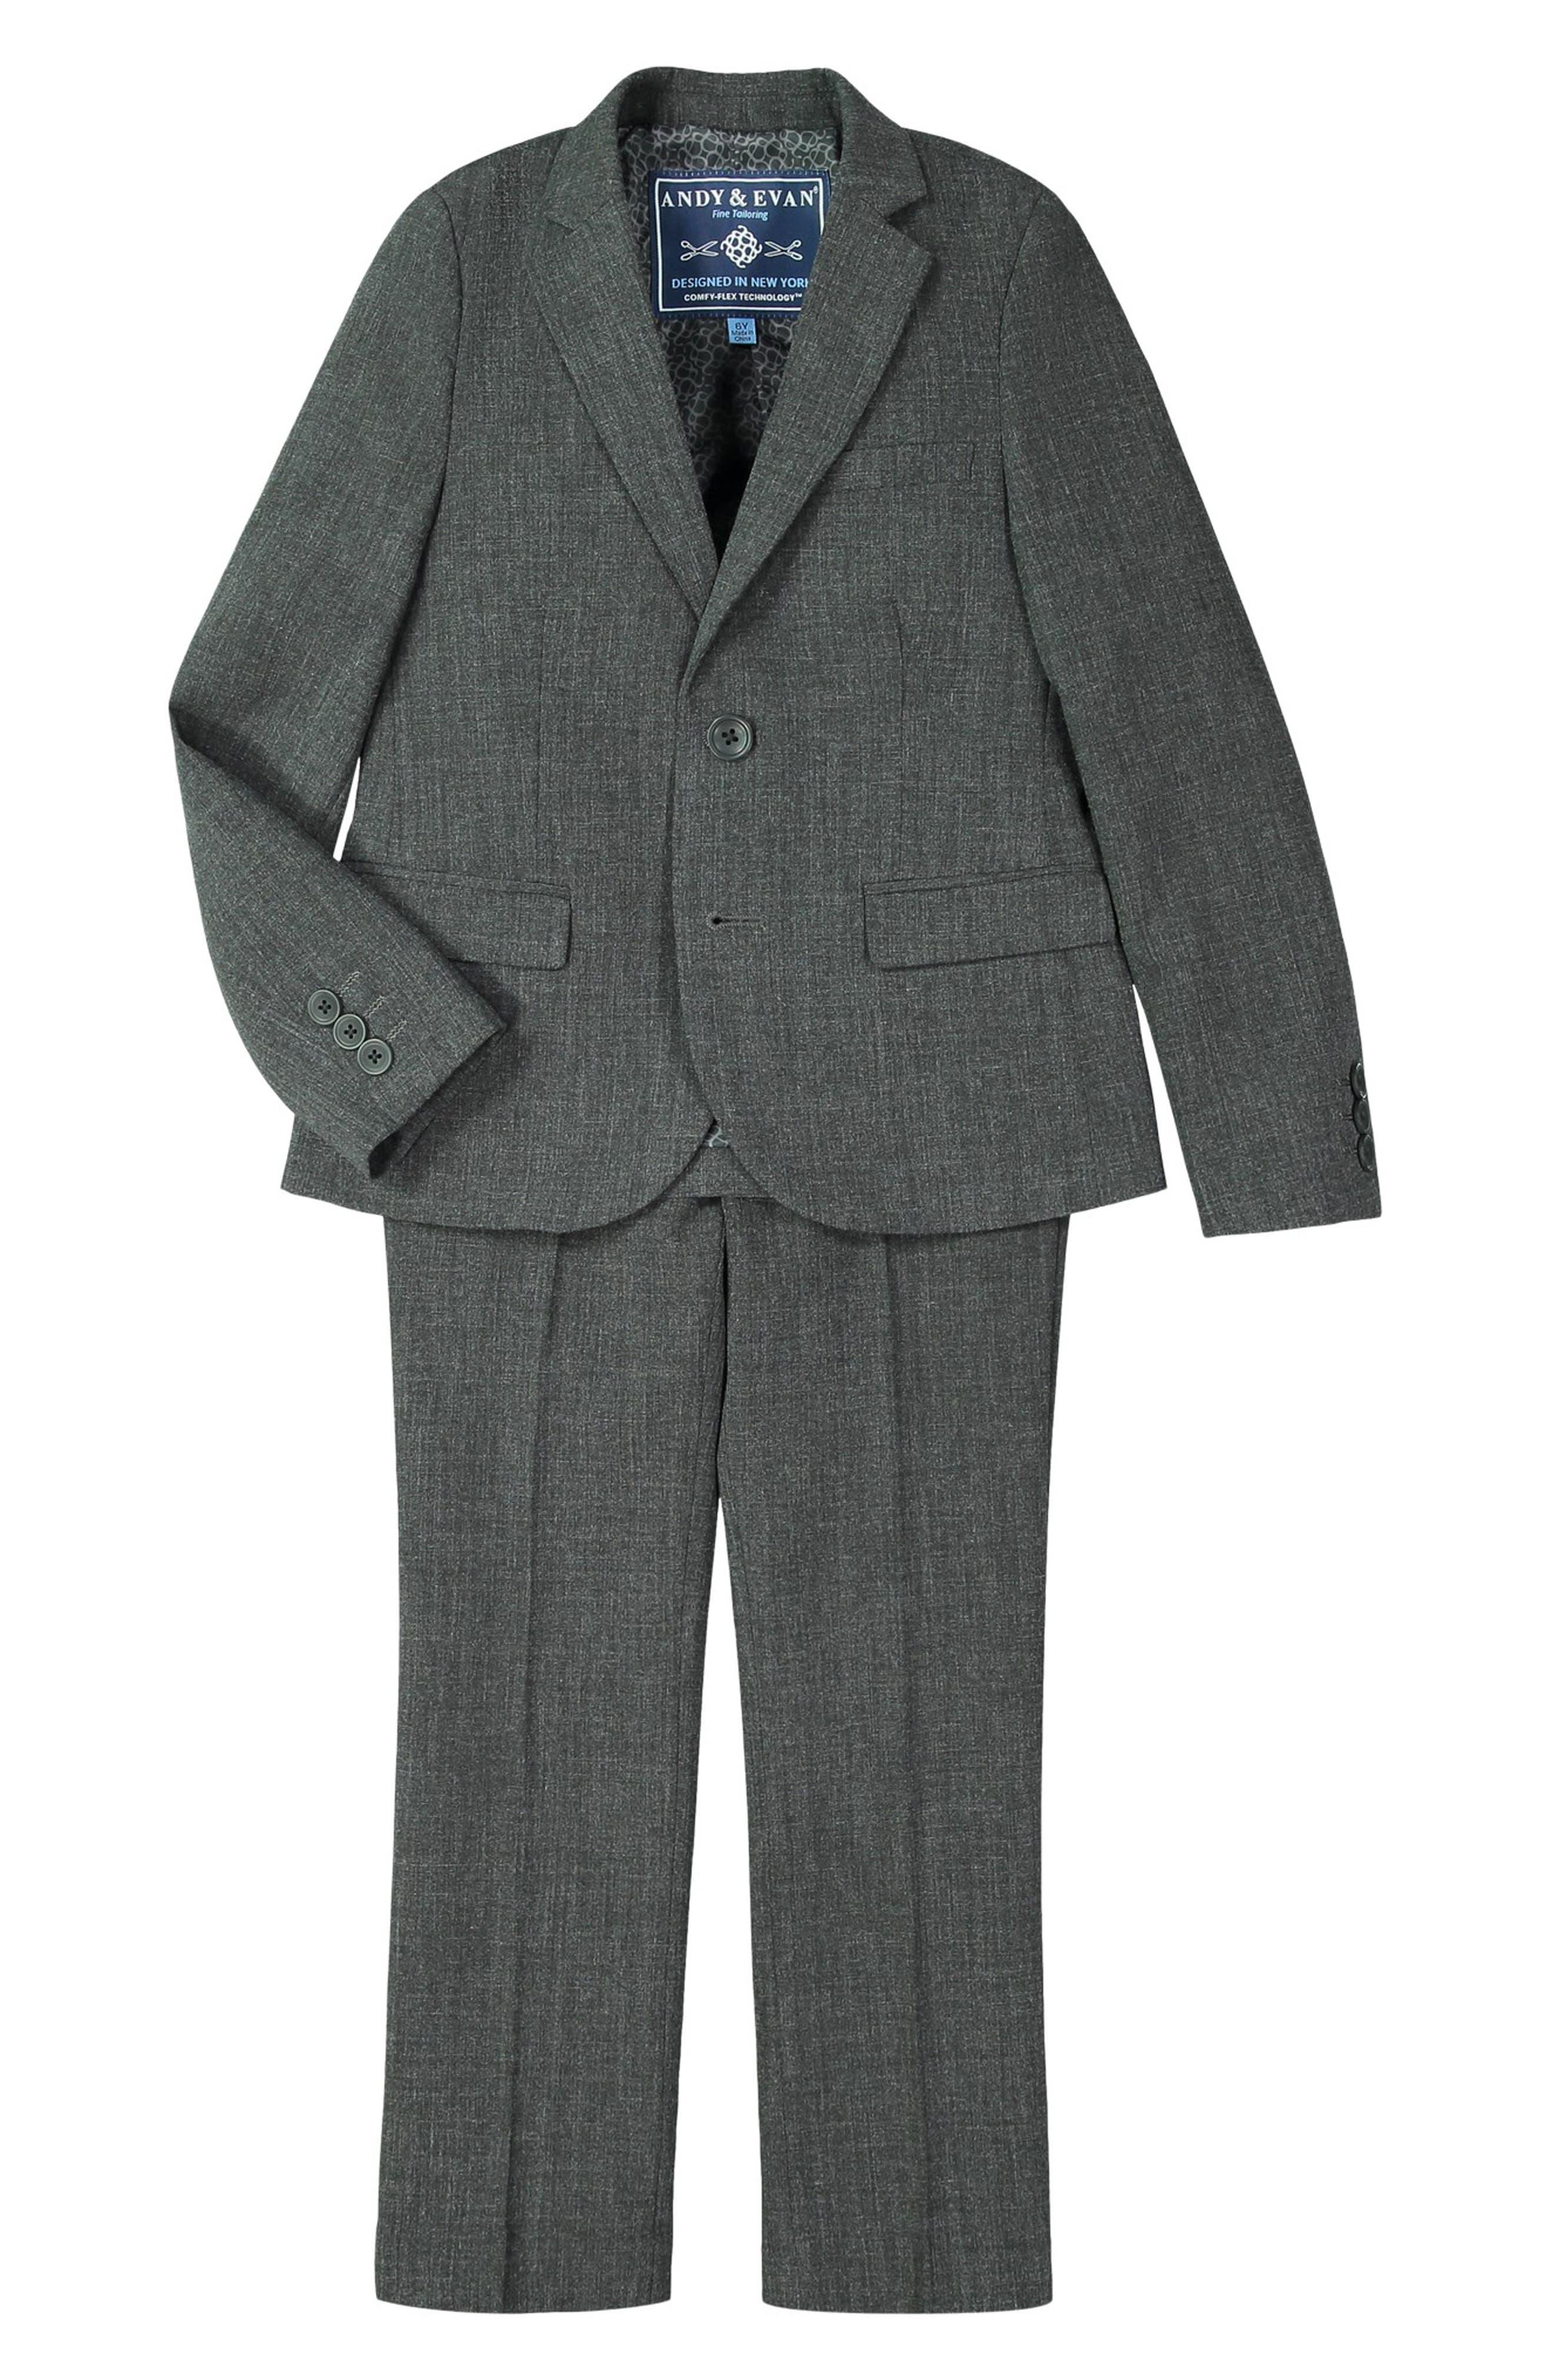 Little Boys Slim Tailored Three-Piece Suit a.x.n.y